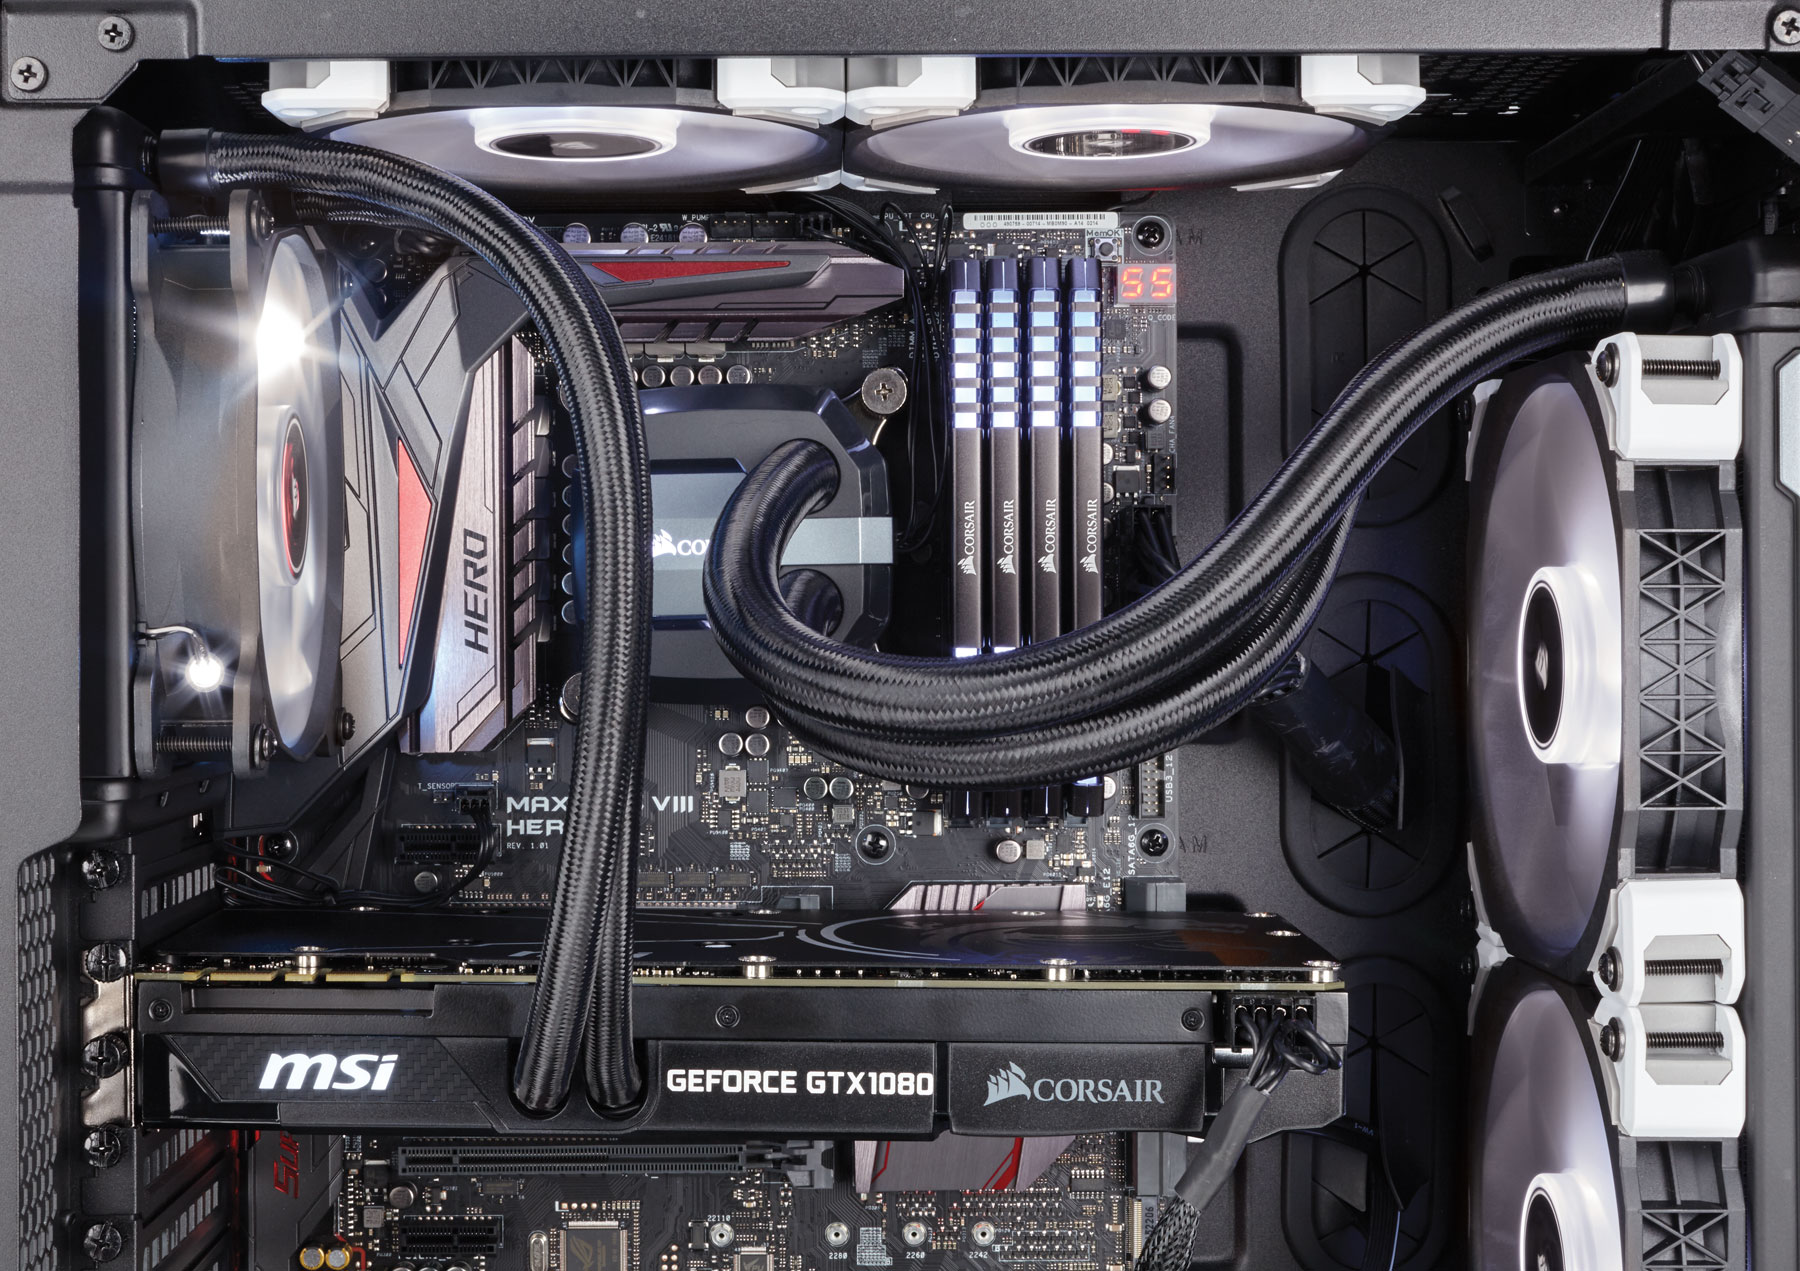 Corsair Launches Hydro Gfx Gtx 1080 Liquid Cooled Graphics